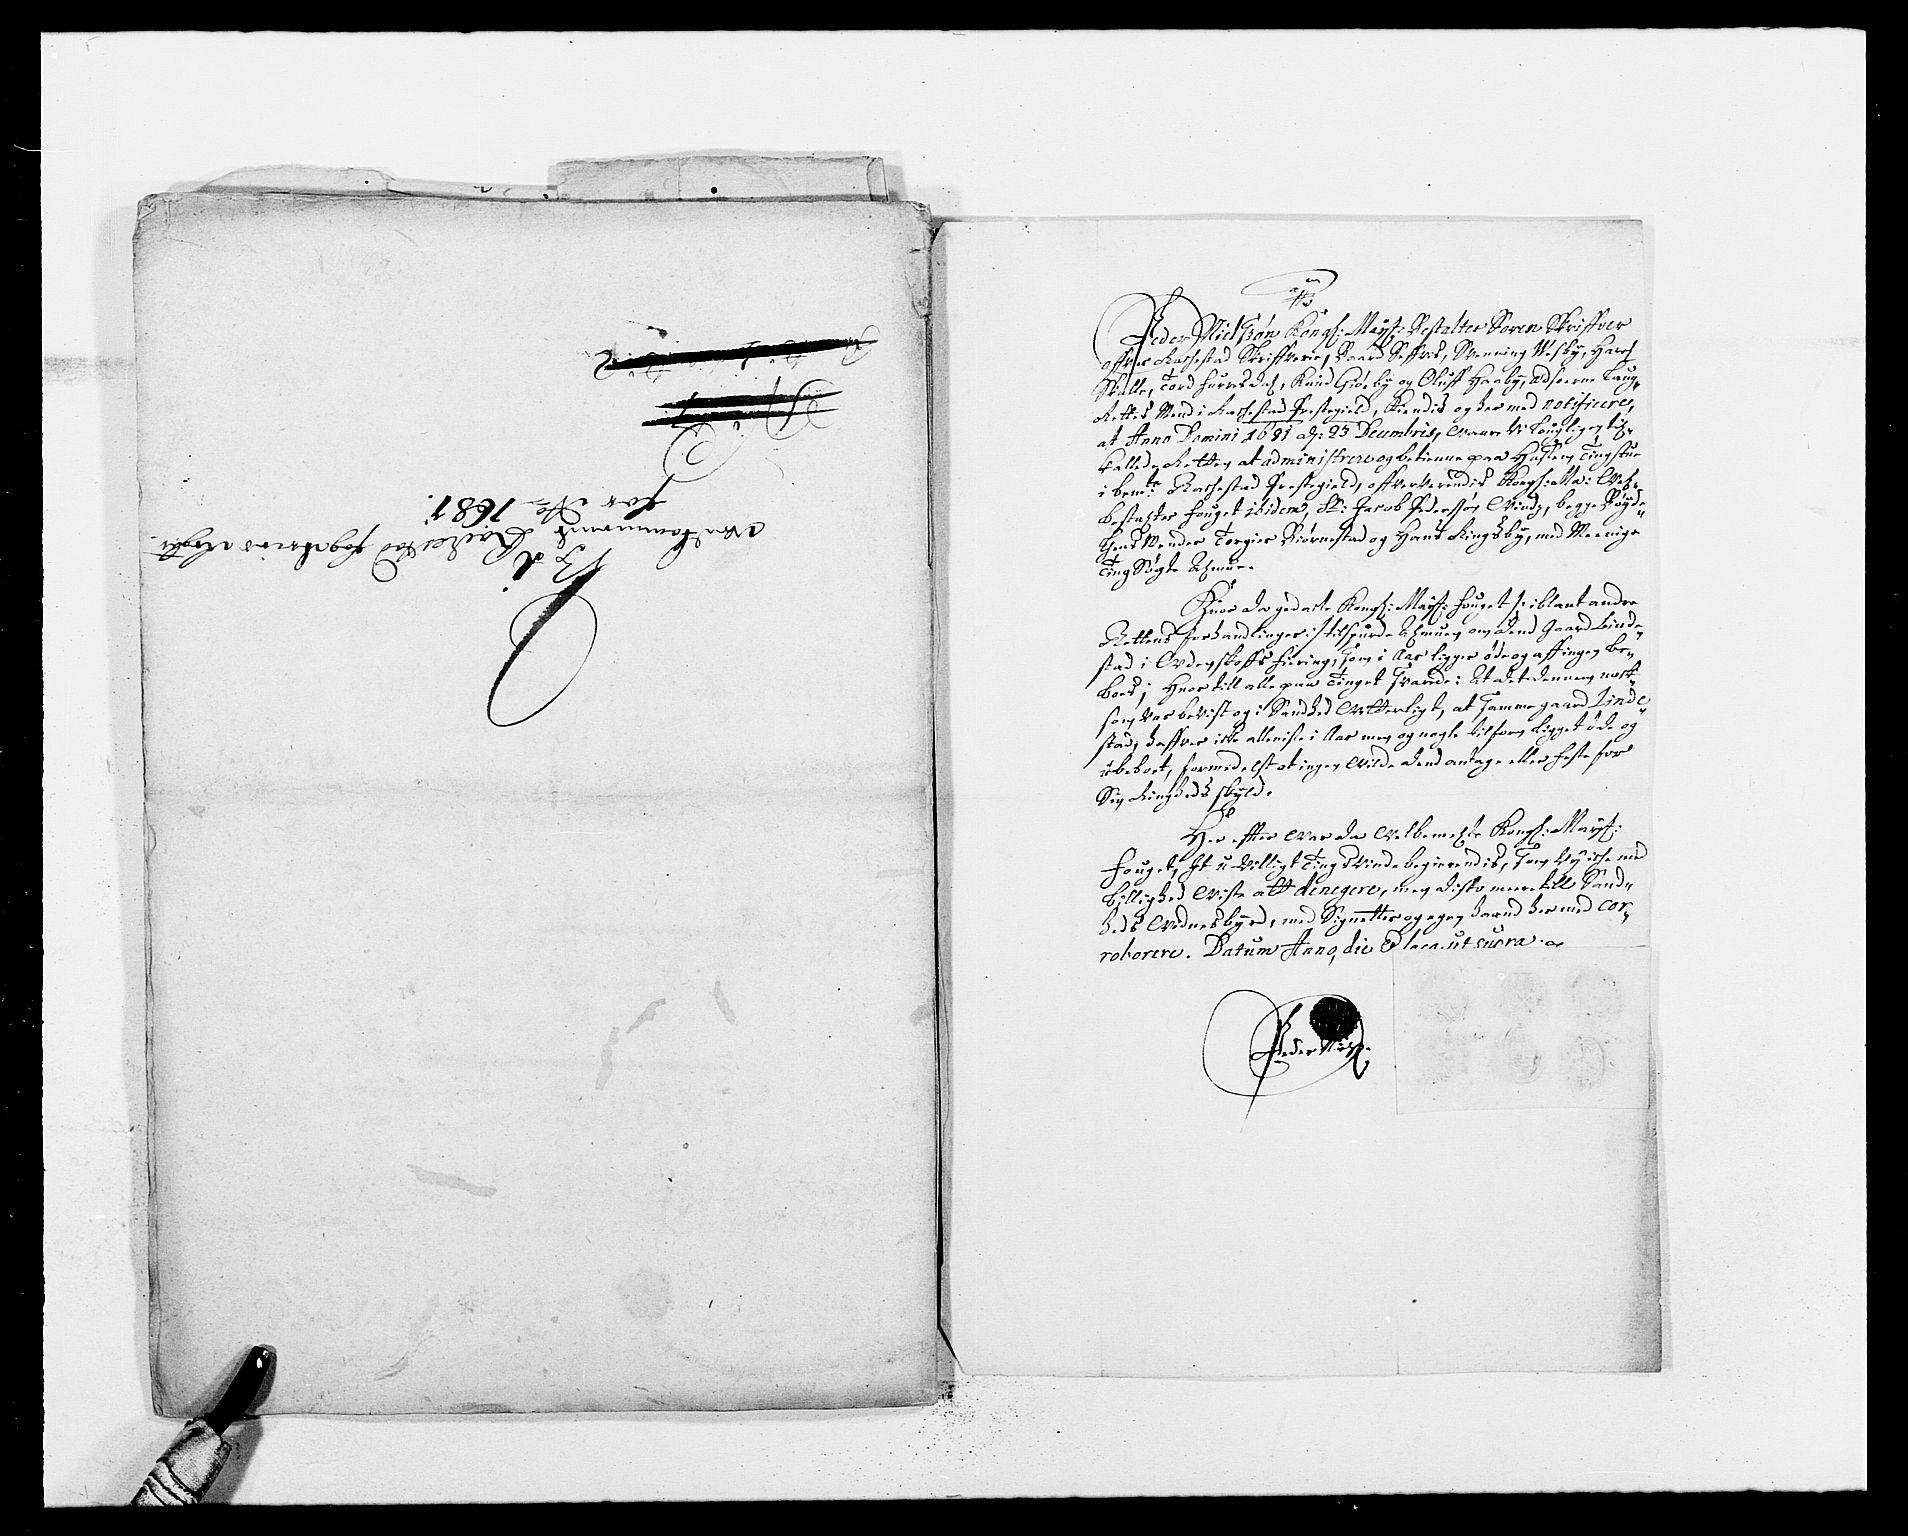 RA, Rentekammeret inntil 1814, Reviderte regnskaper, Fogderegnskap, R05/L0272: Fogderegnskap Rakkestad, 1680-1681, s. 433